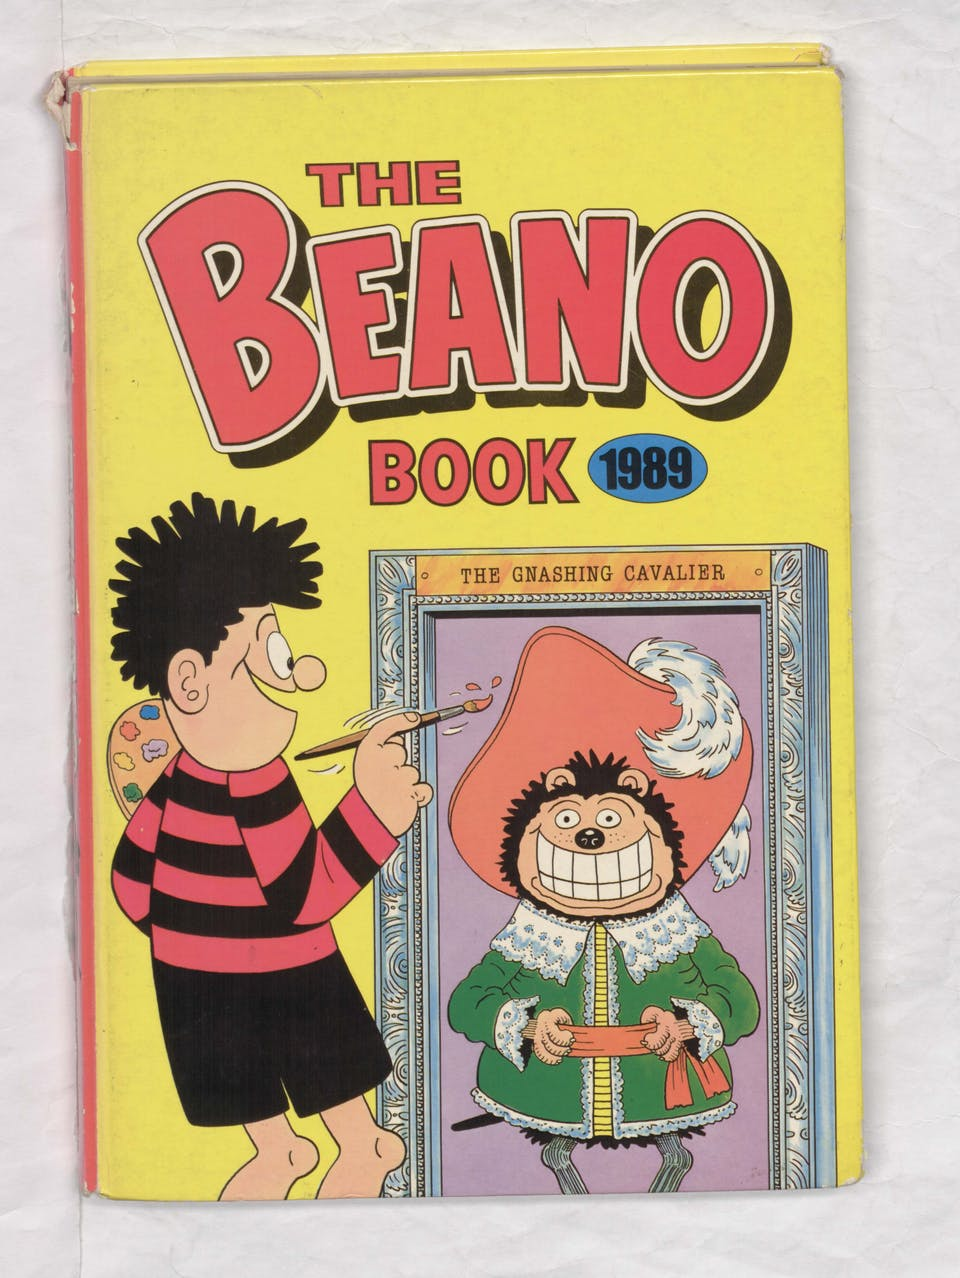 Beano Book 1989 Annual Cover